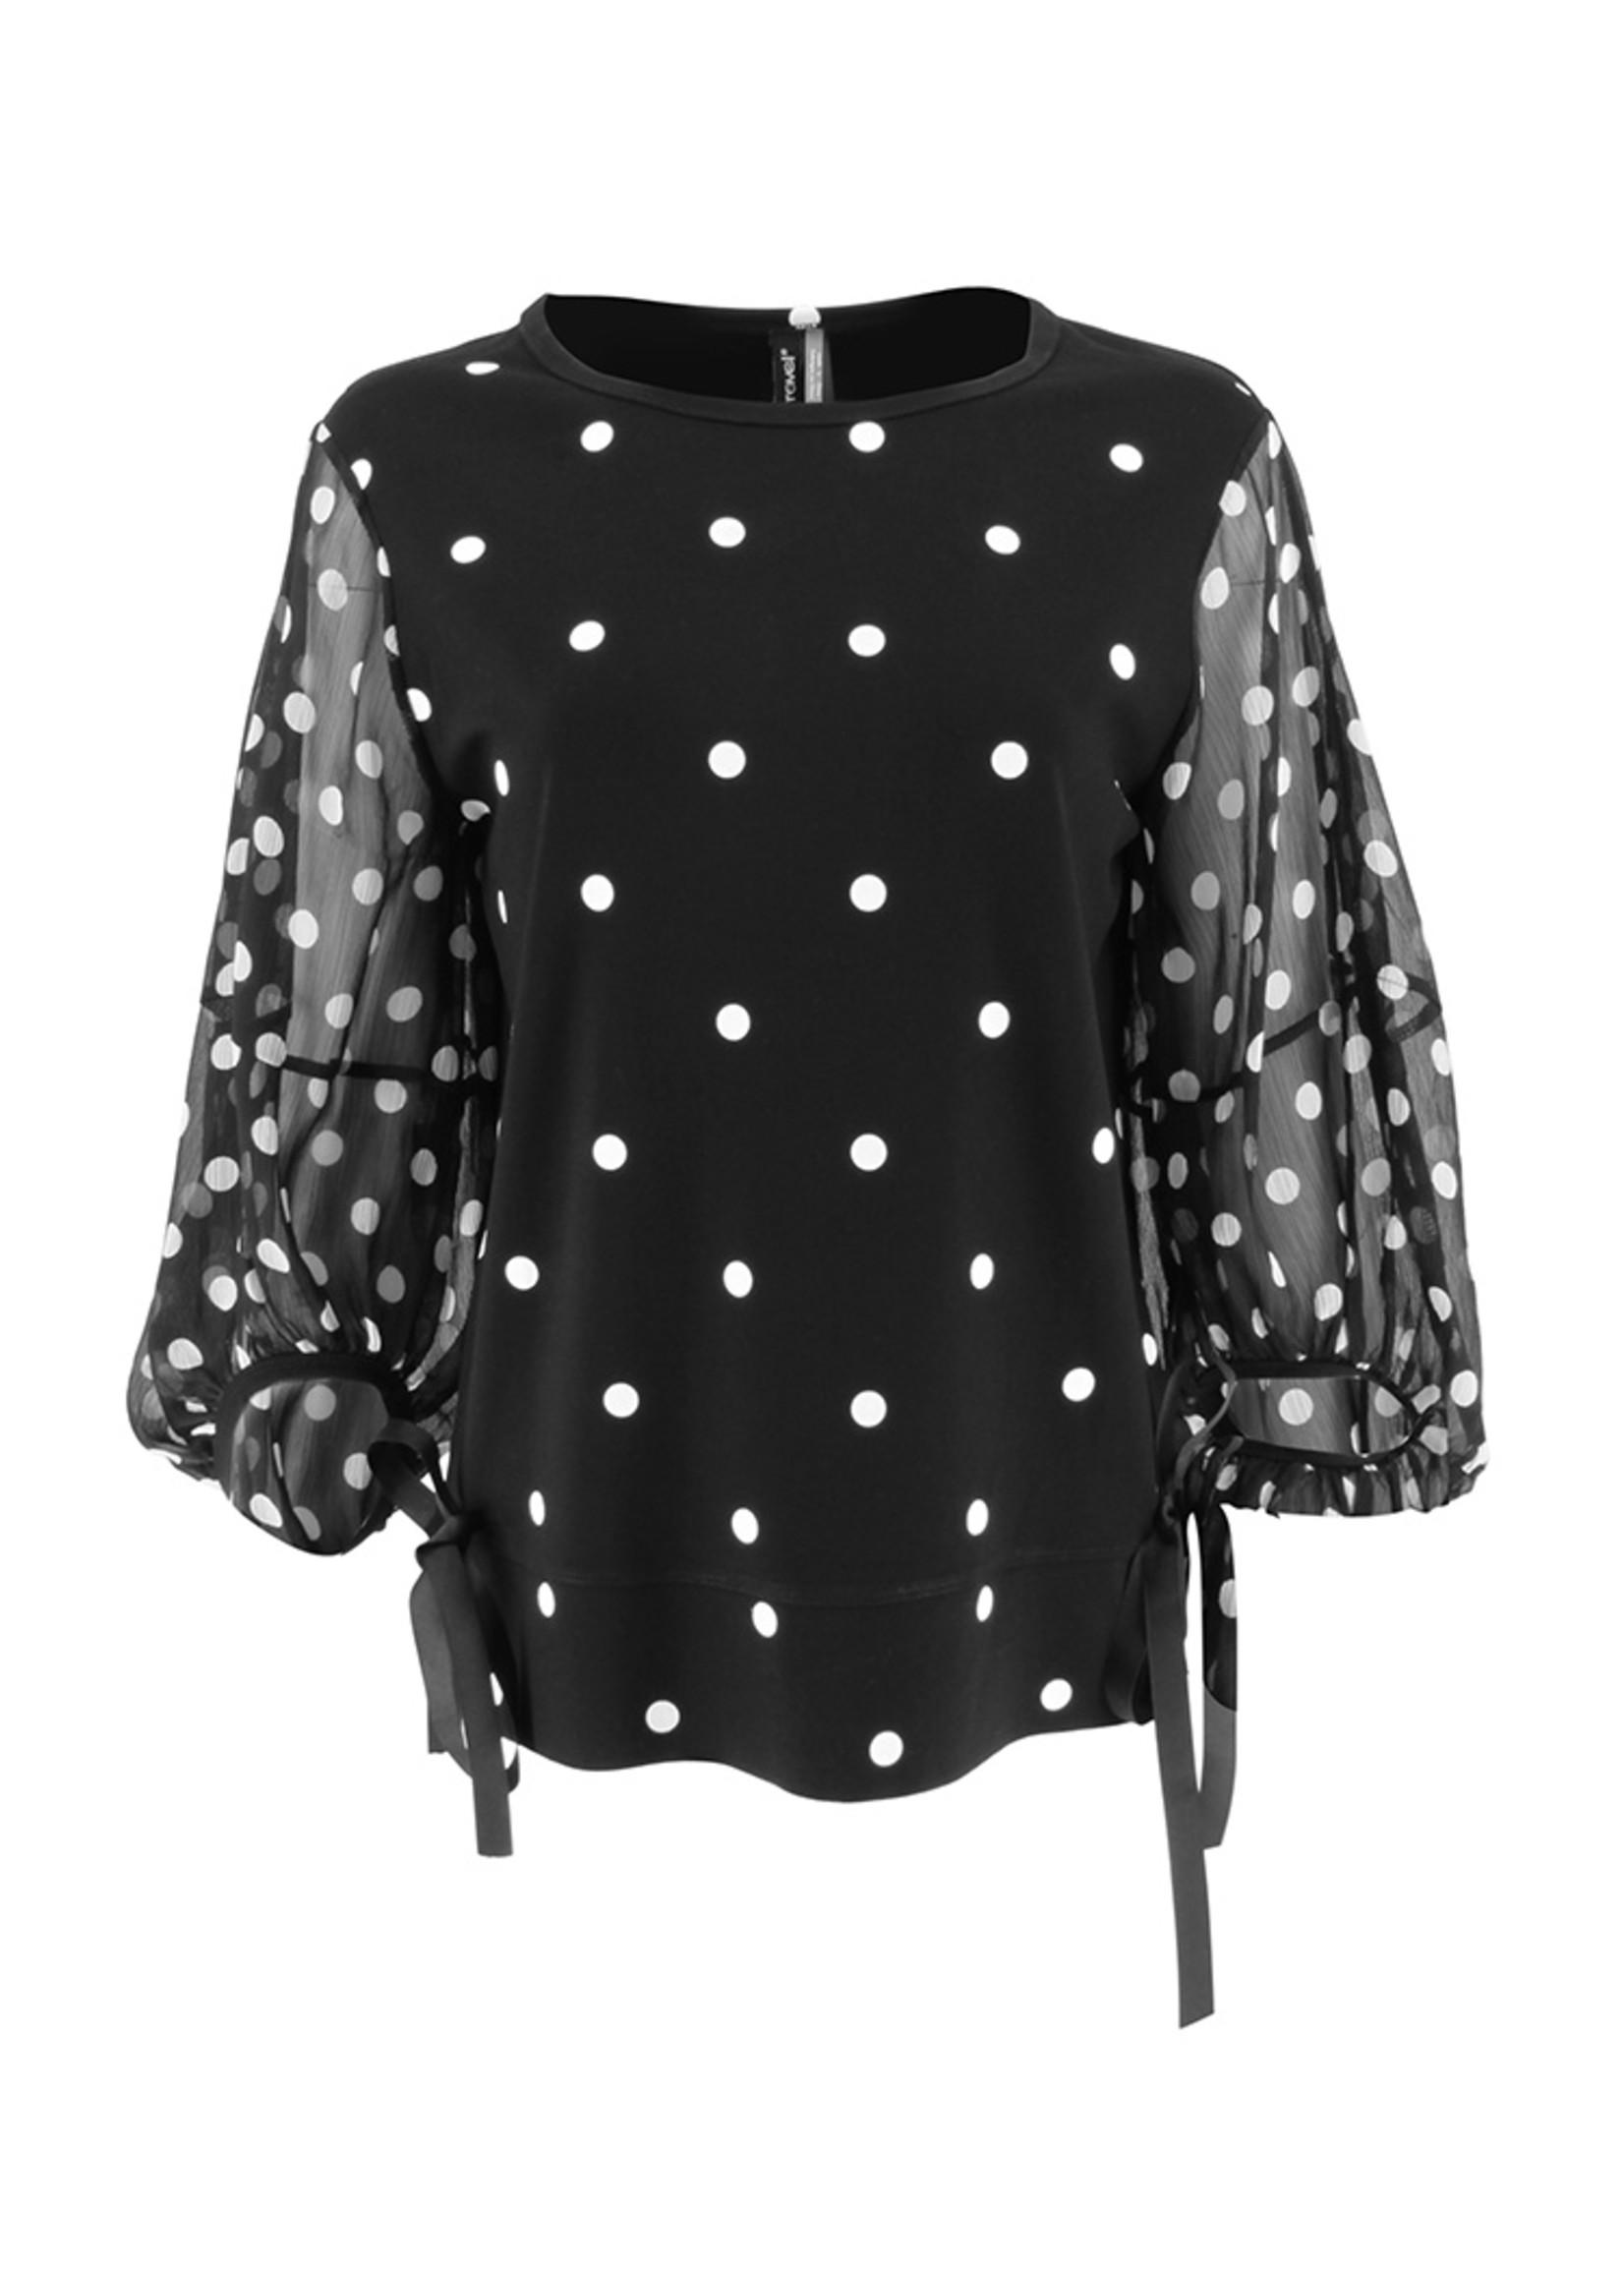 Ravel Black and White Polka Dot Top Sheer Sleeves Large